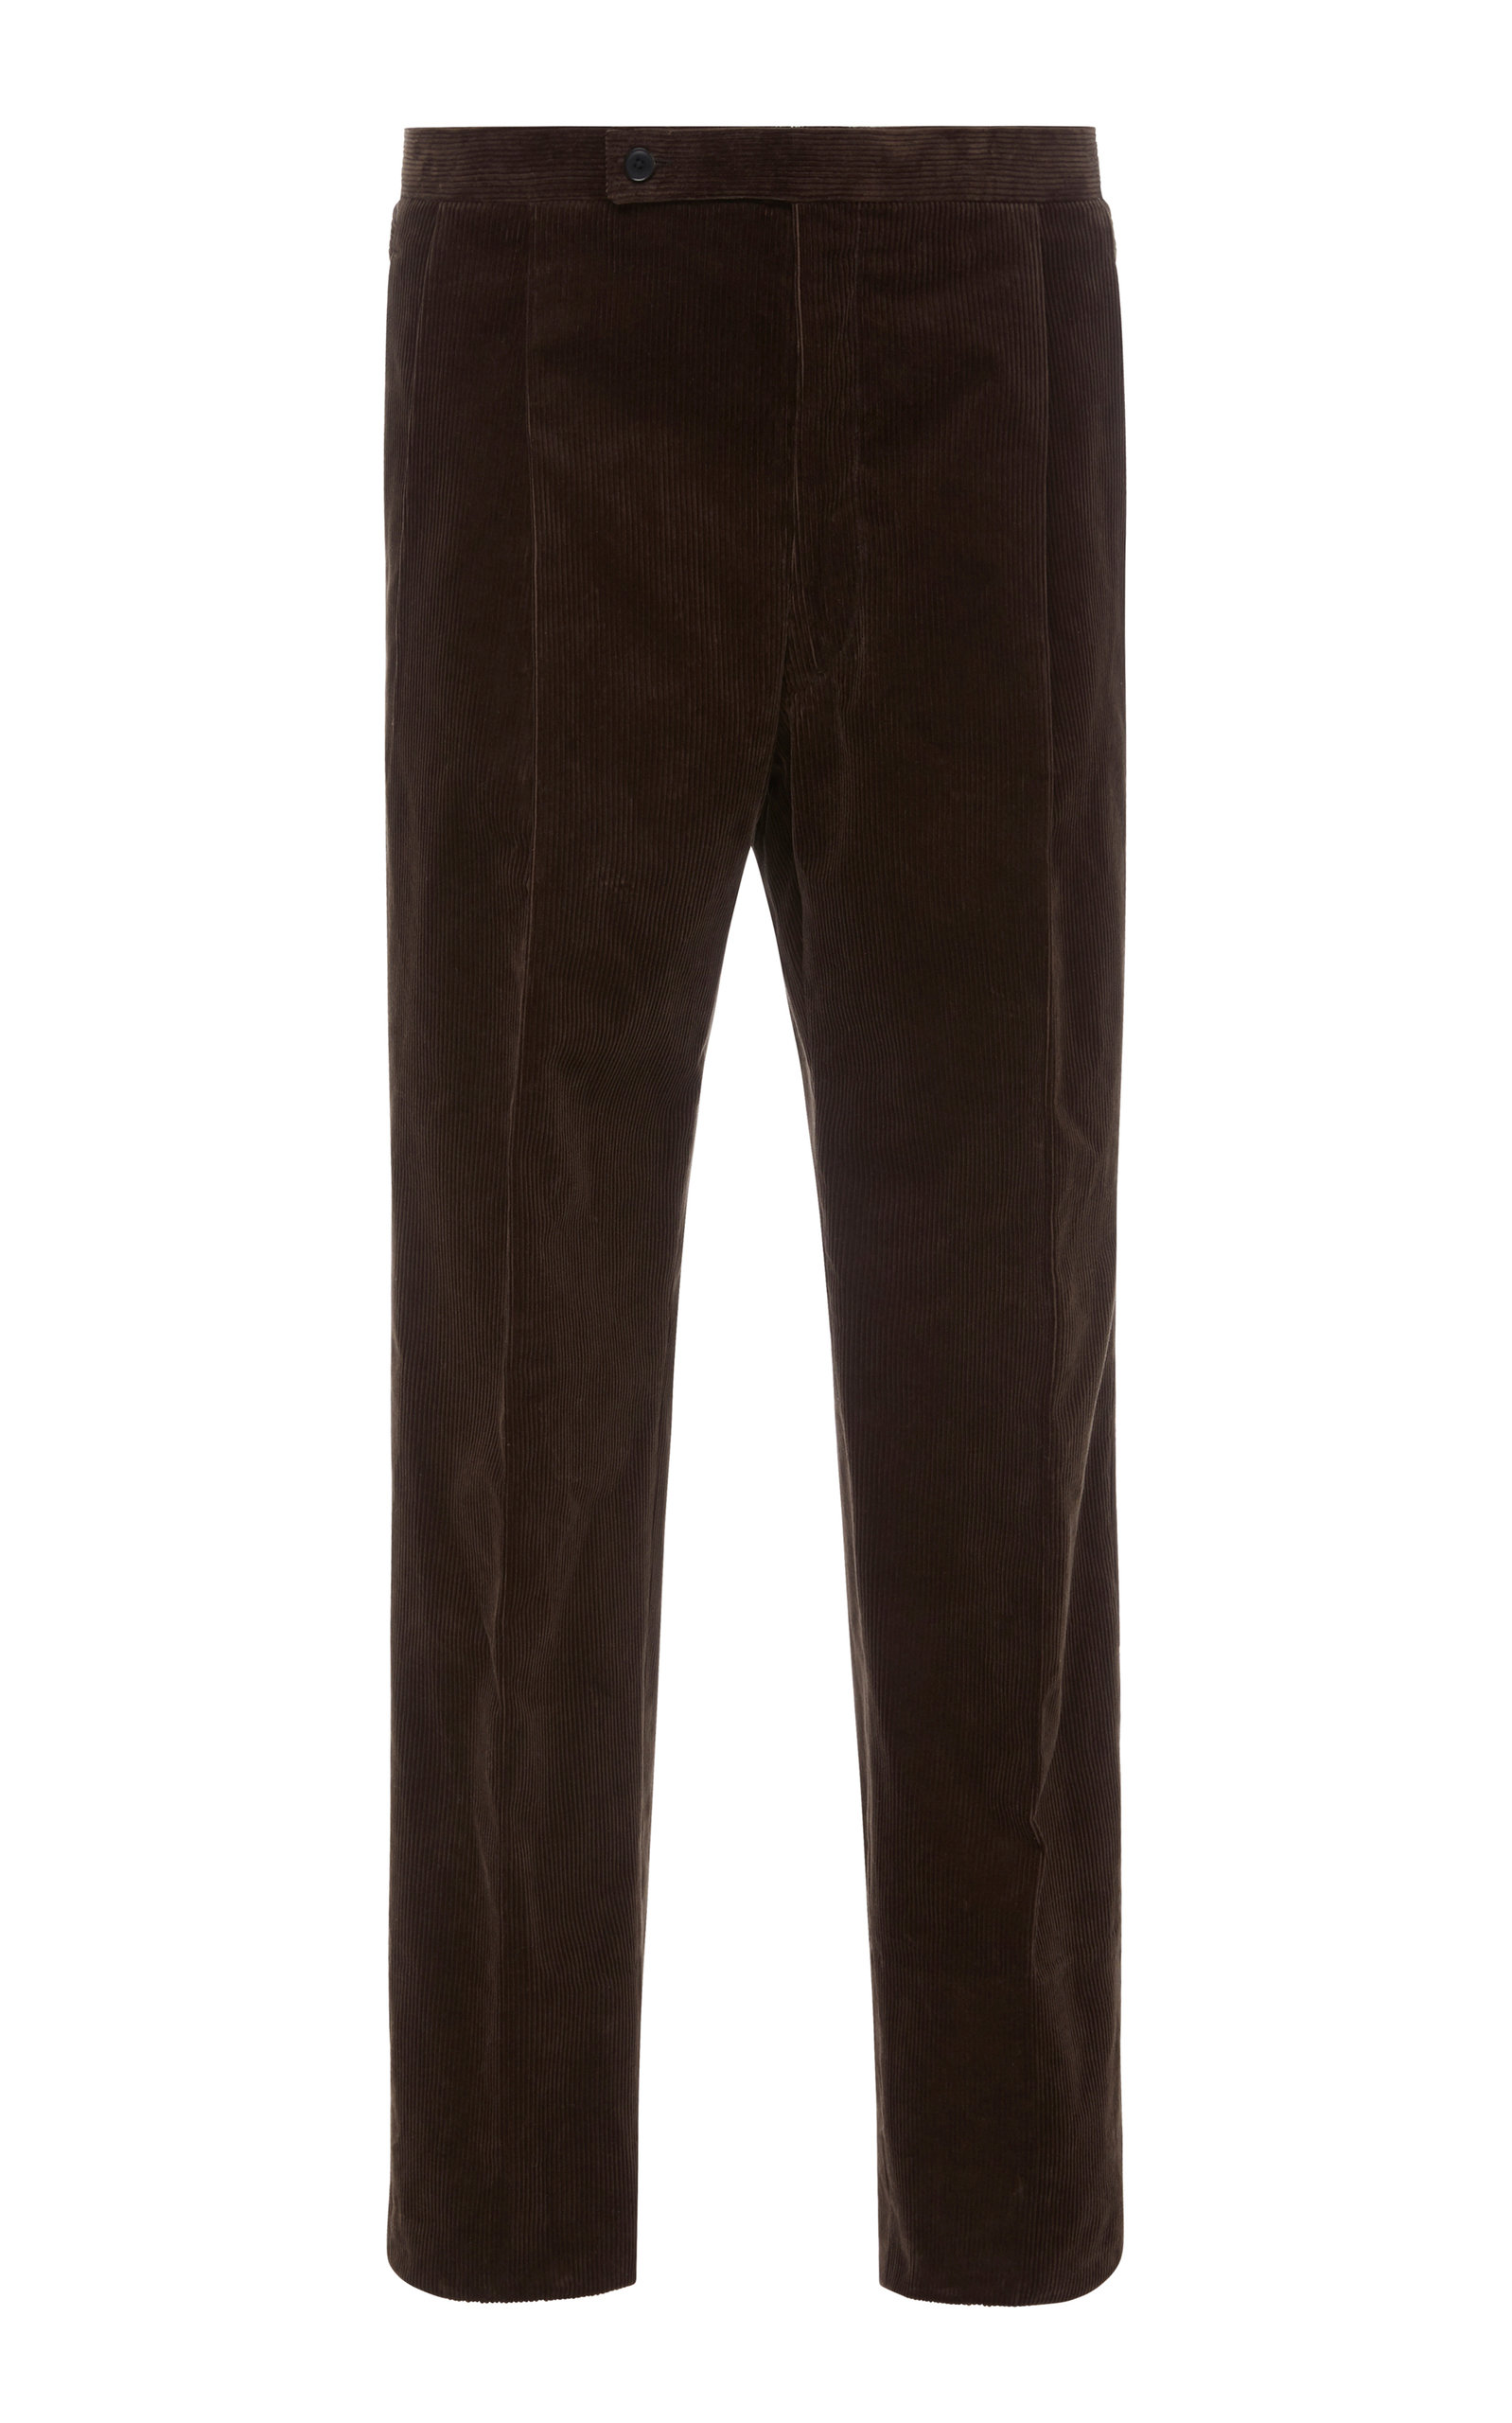 CAMOSHITA CORDUROY BOX PLEAT DRESS PANTS